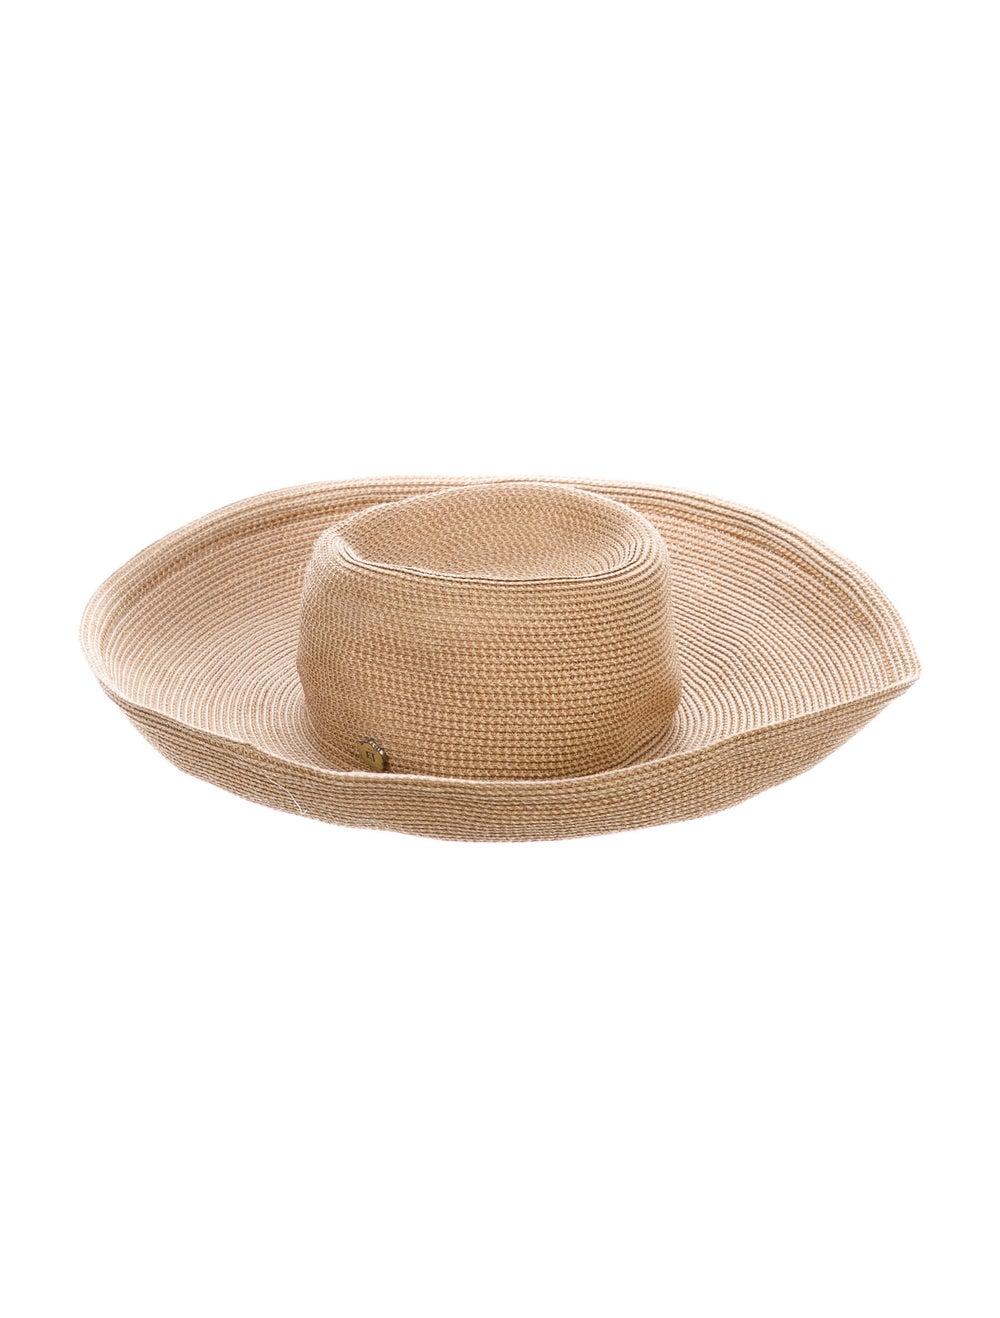 Eric Javits Wide Brim Hat - image 2